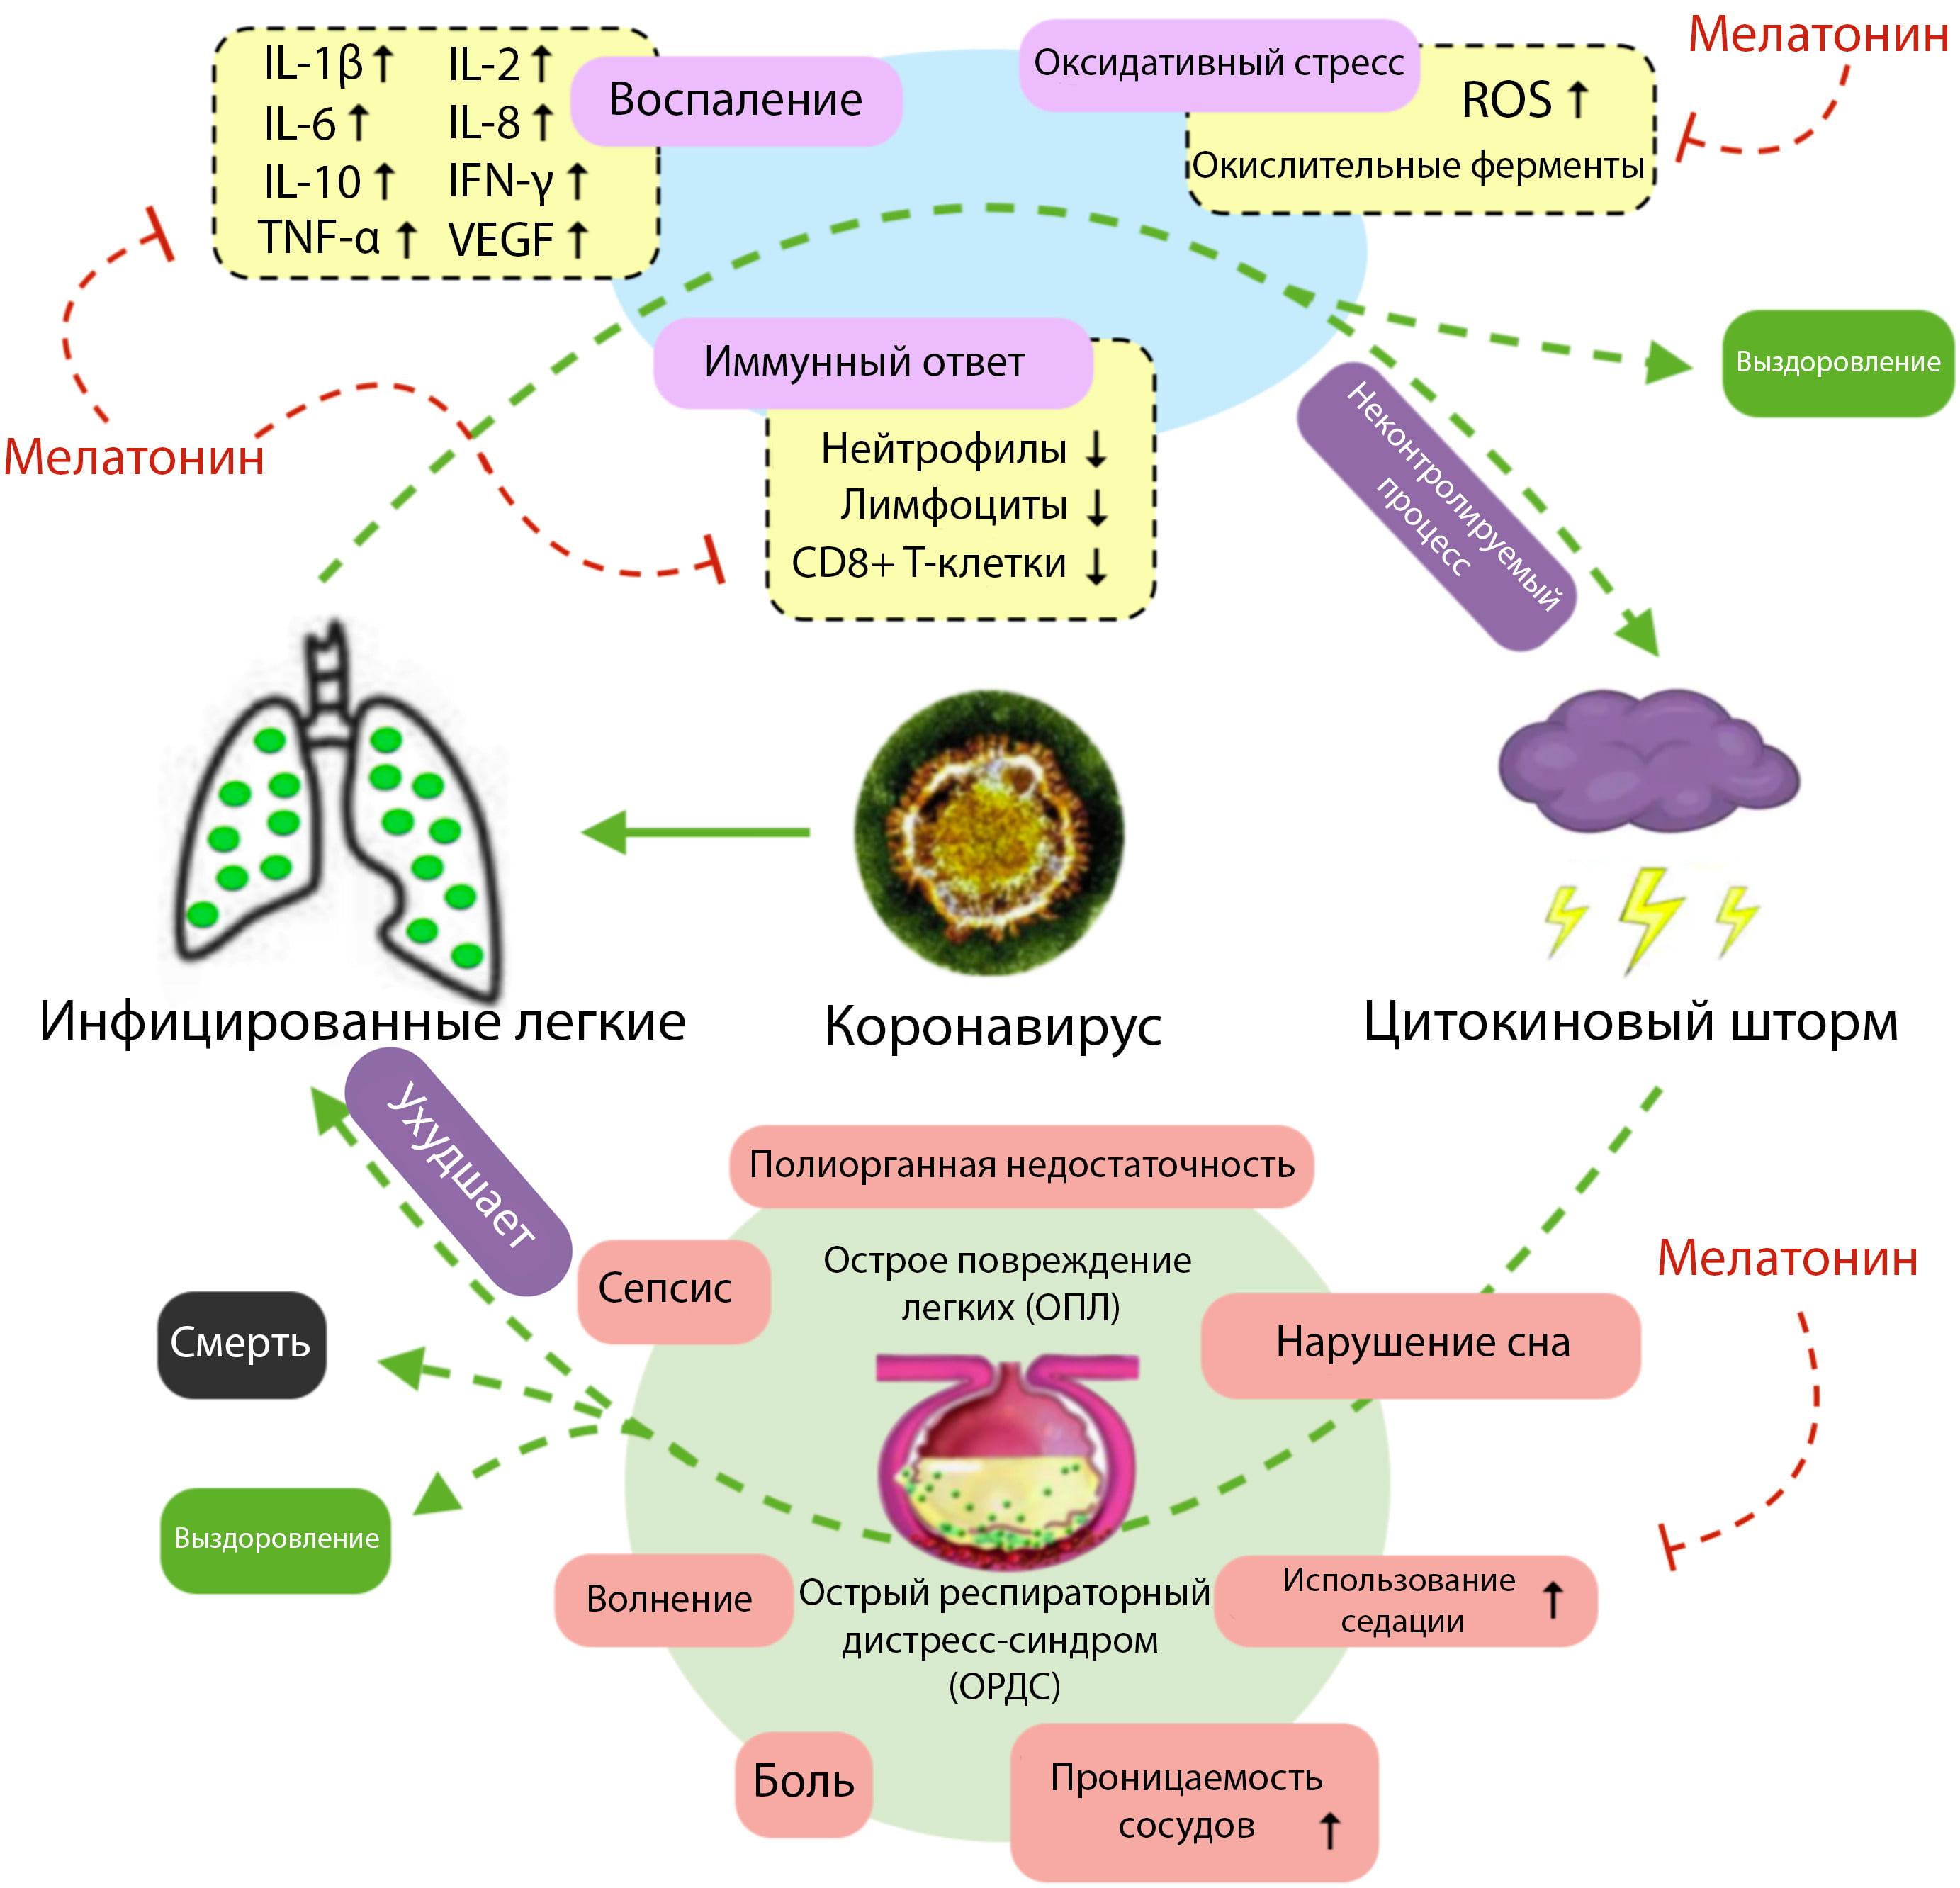 Рис.1. Патогенез COVID-19 и потенциальное адъювантное применение мелатонина при коронавирусе